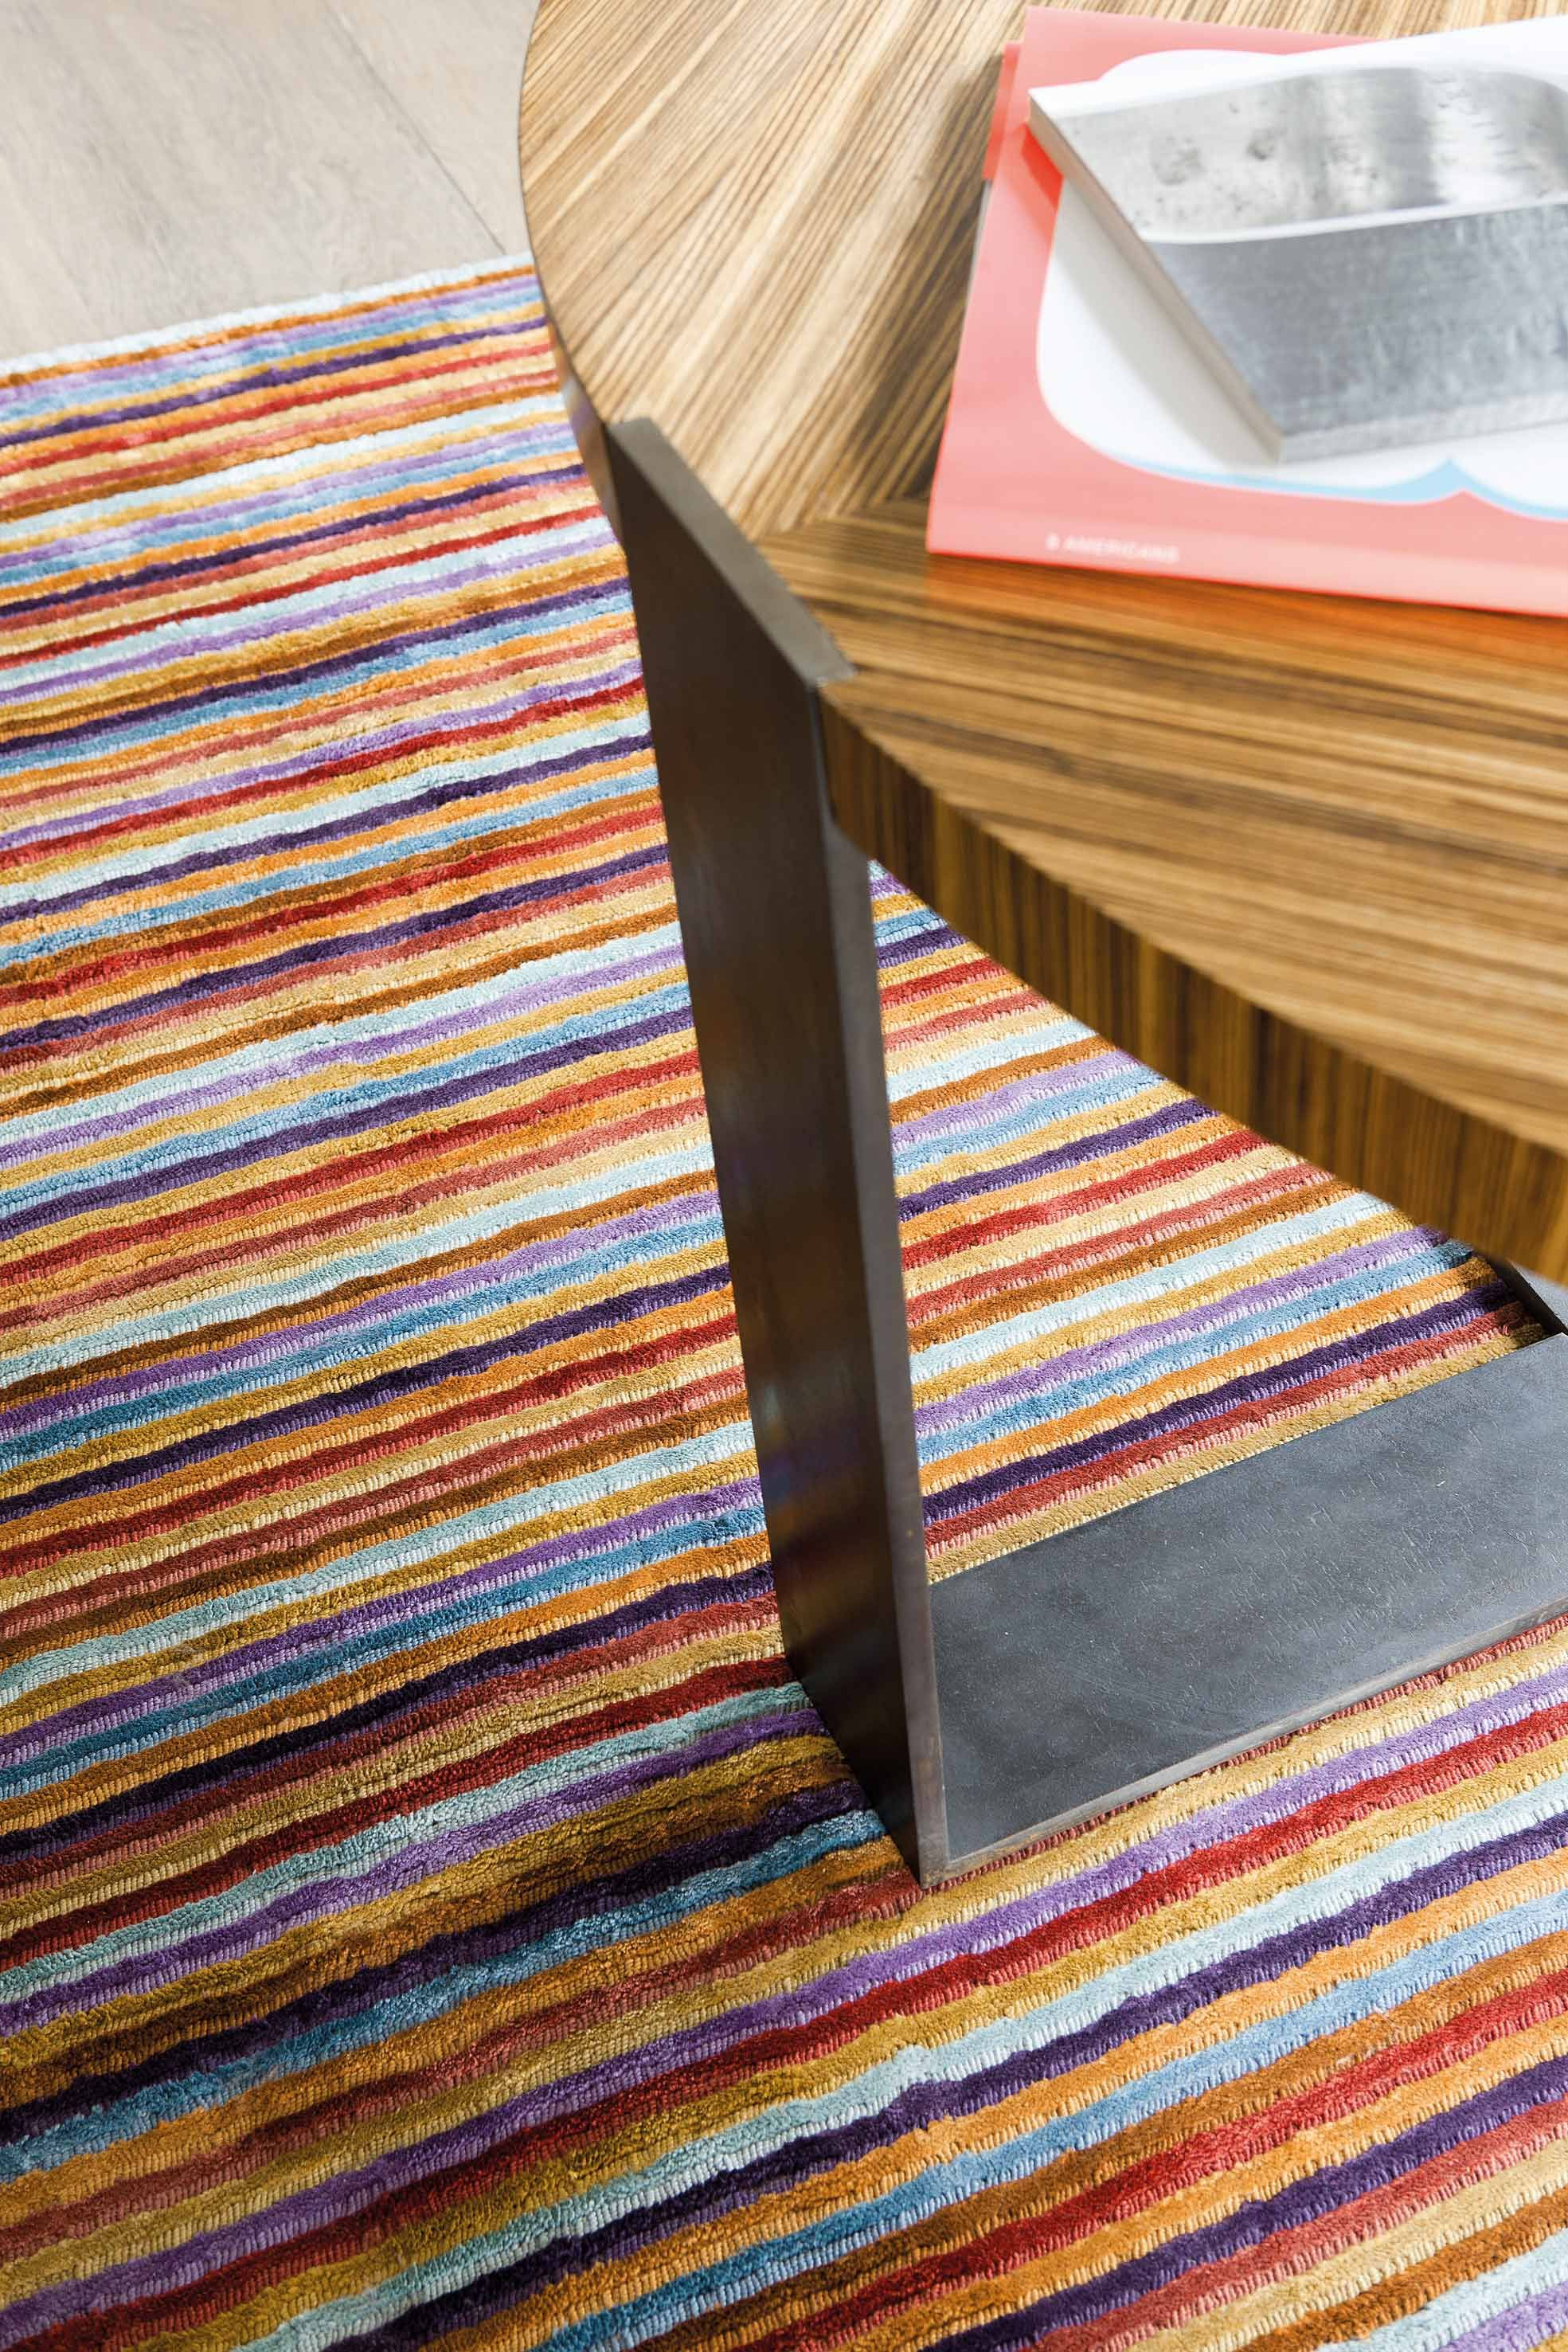 Love Carpet http://heavenrugs.com/carpet/love-modern-60x120-rectangle-202_001_990